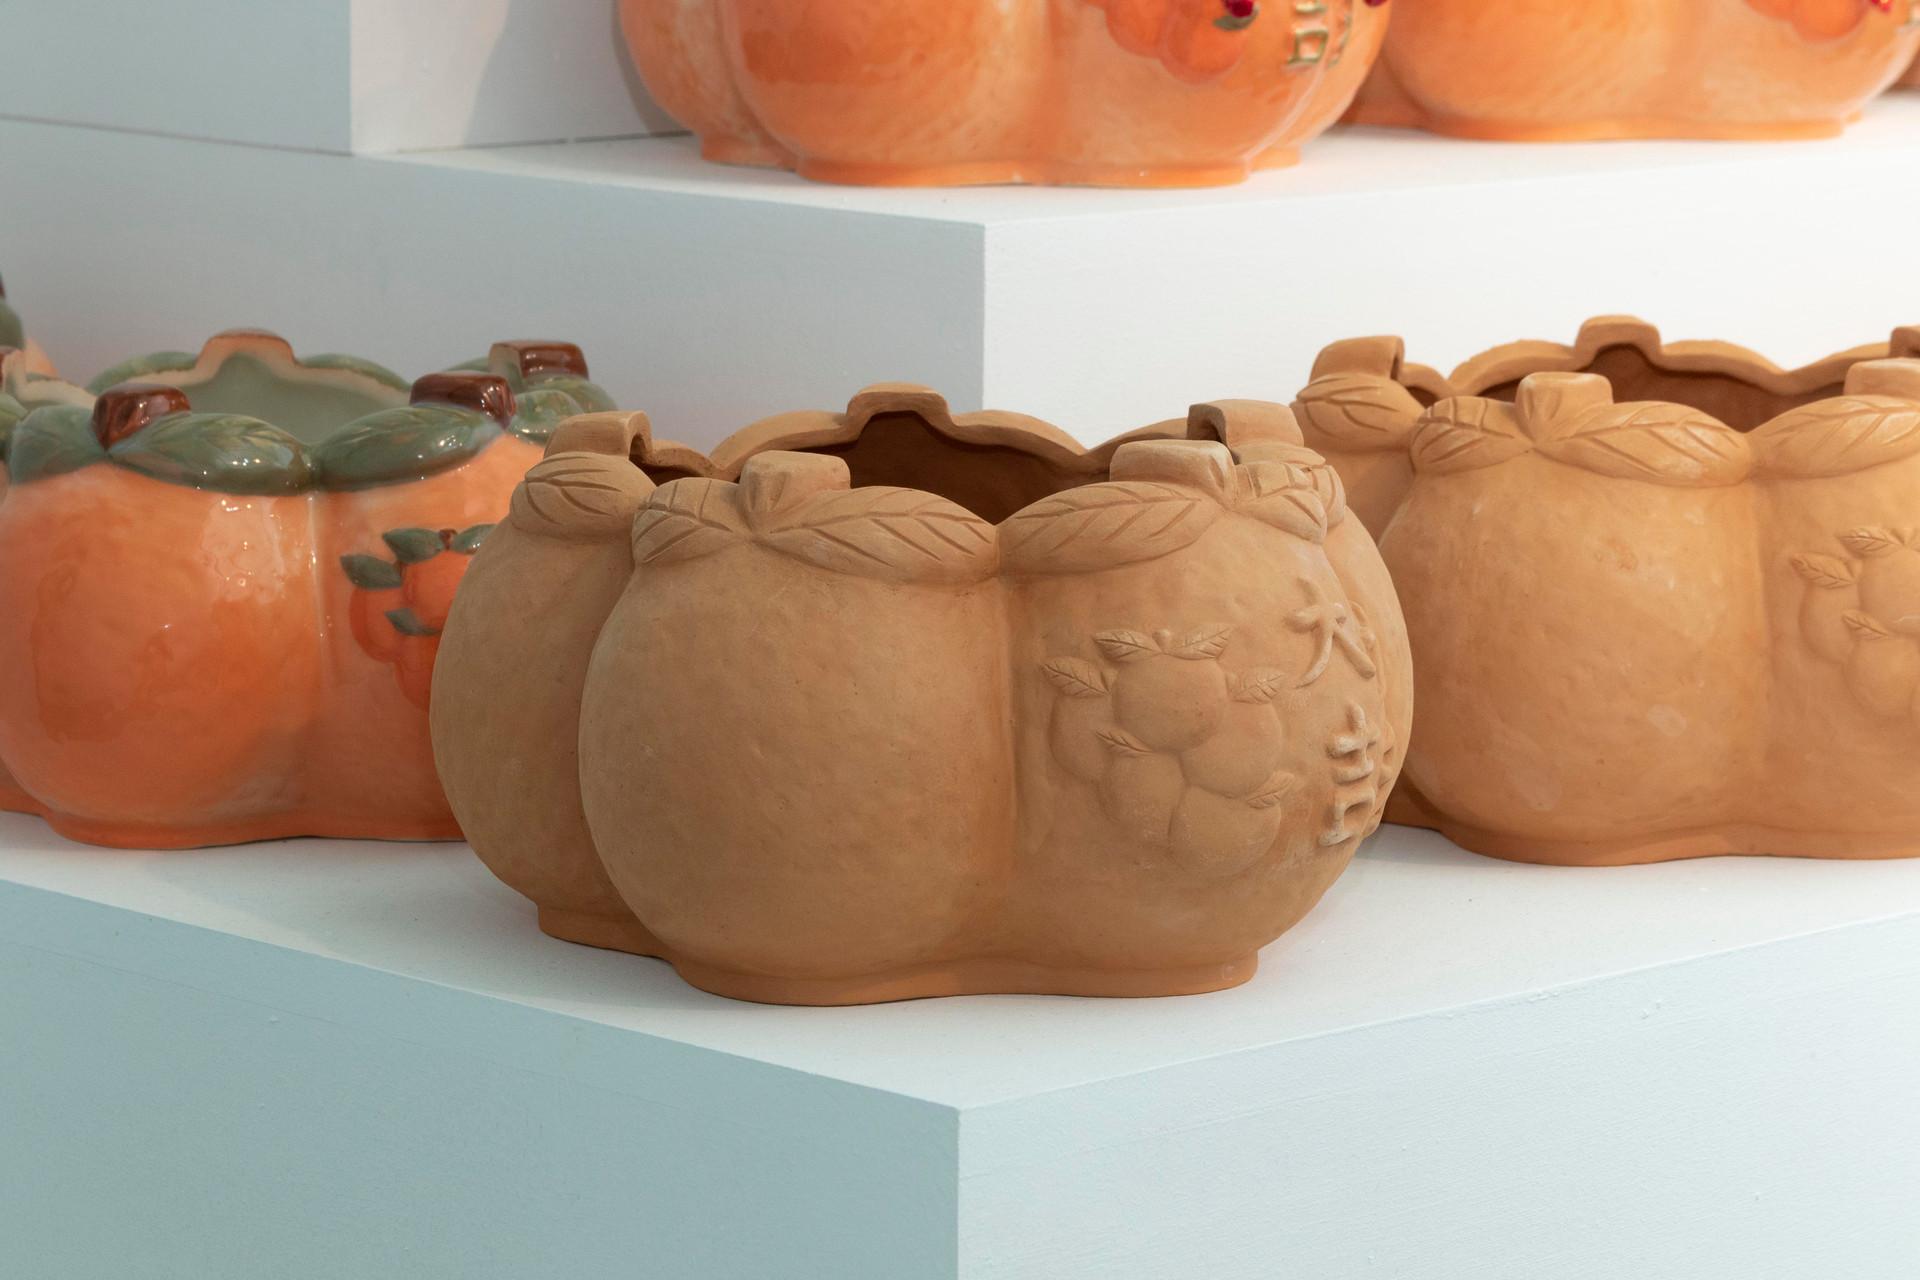 大吉大利五橘盆器(六甲土版)/Five Oranges Fortune Pottery Planter (Liujia Soil Edition)